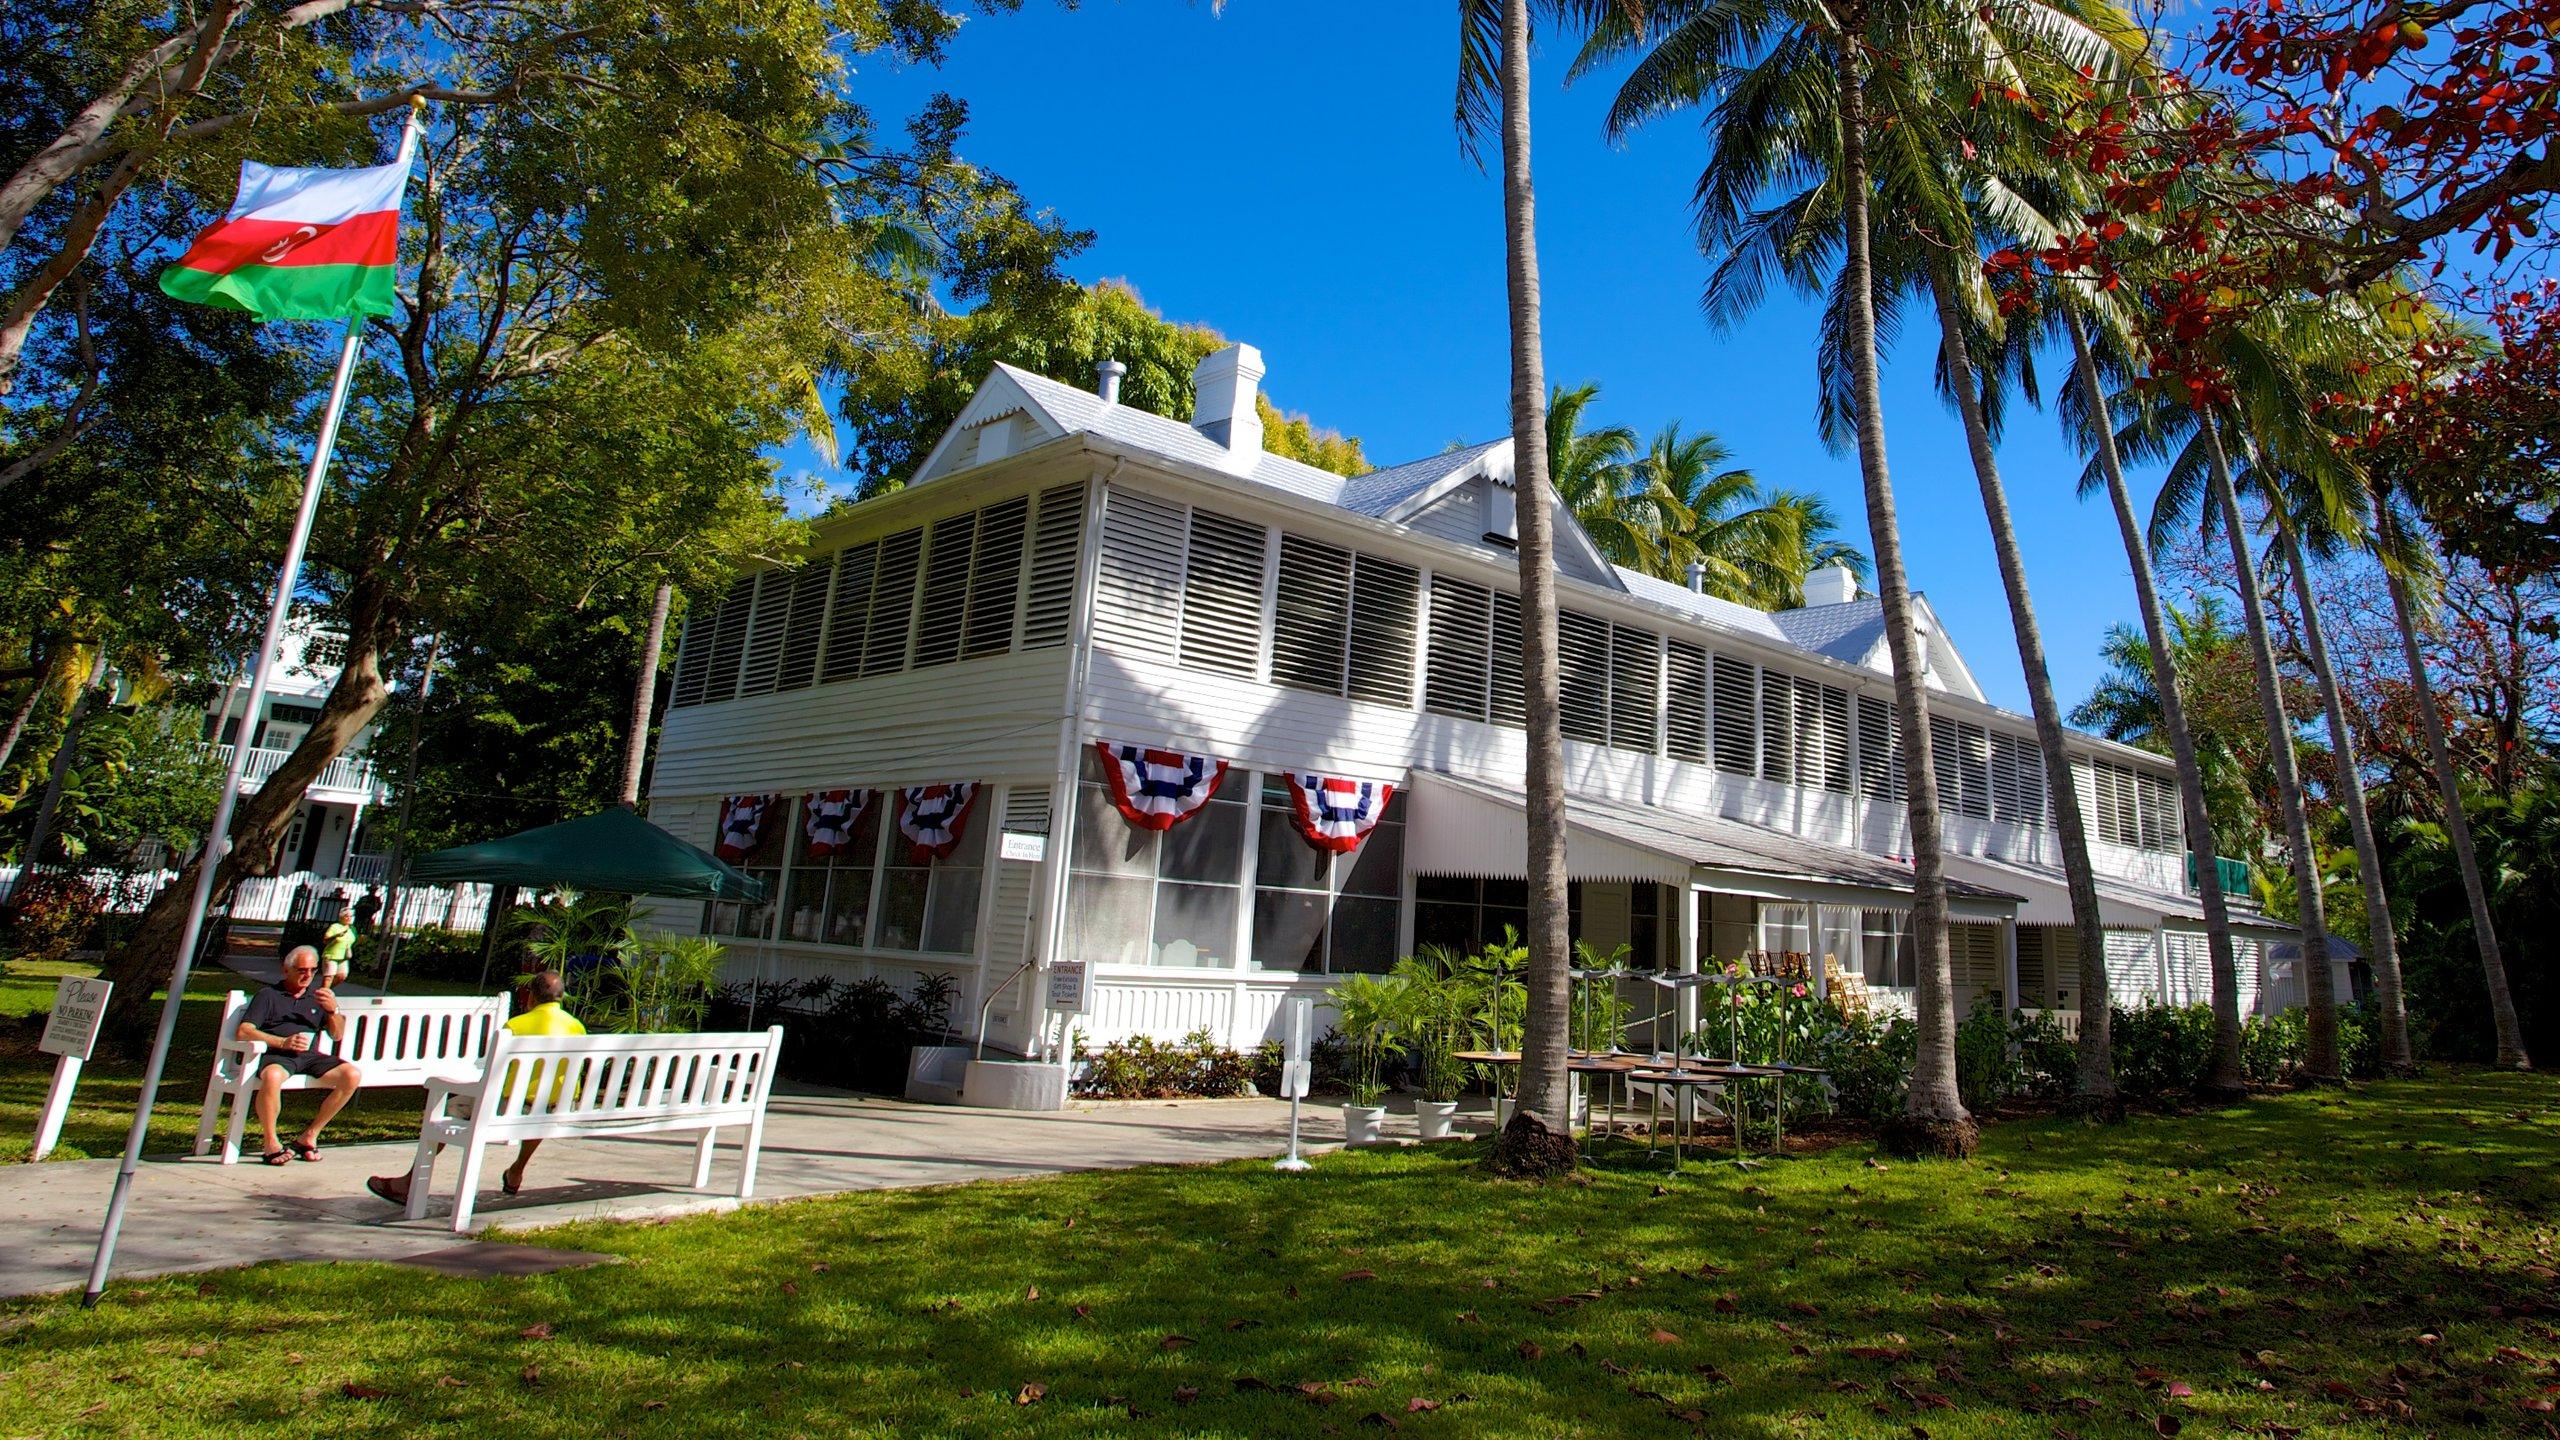 Harry S. Truman Little White House, Key West, Florida, United States of America